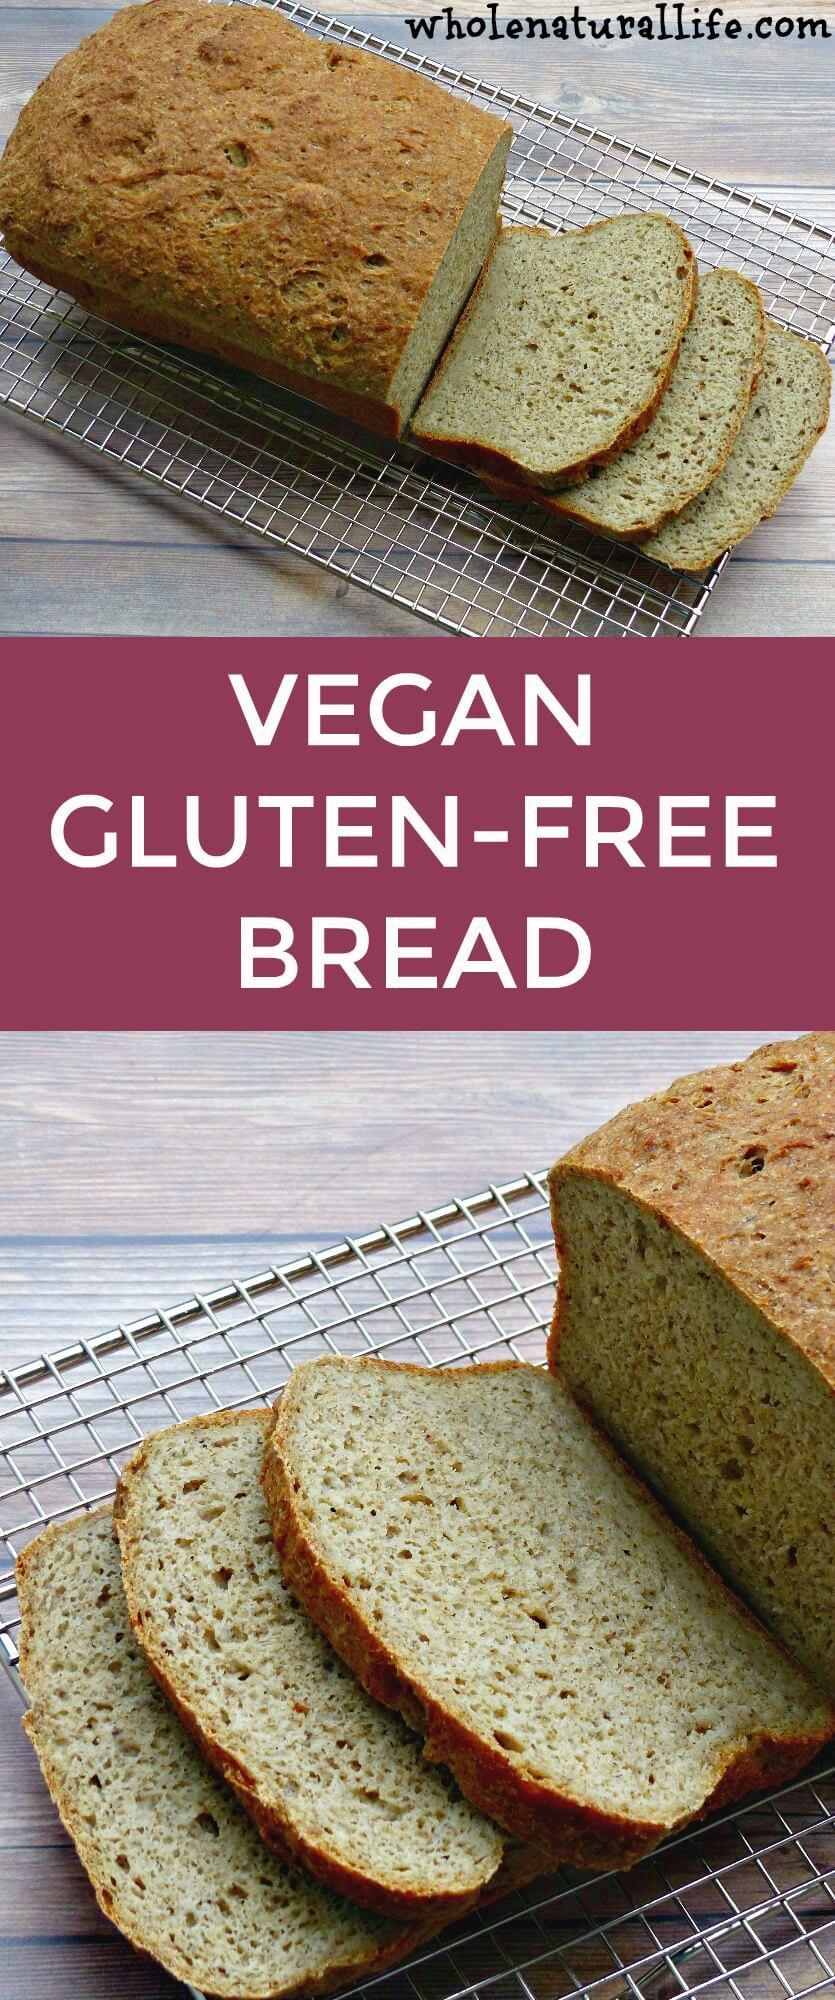 Gluten Free Bread Recipe  Vegan Gluten free Bread Whole Natural Life